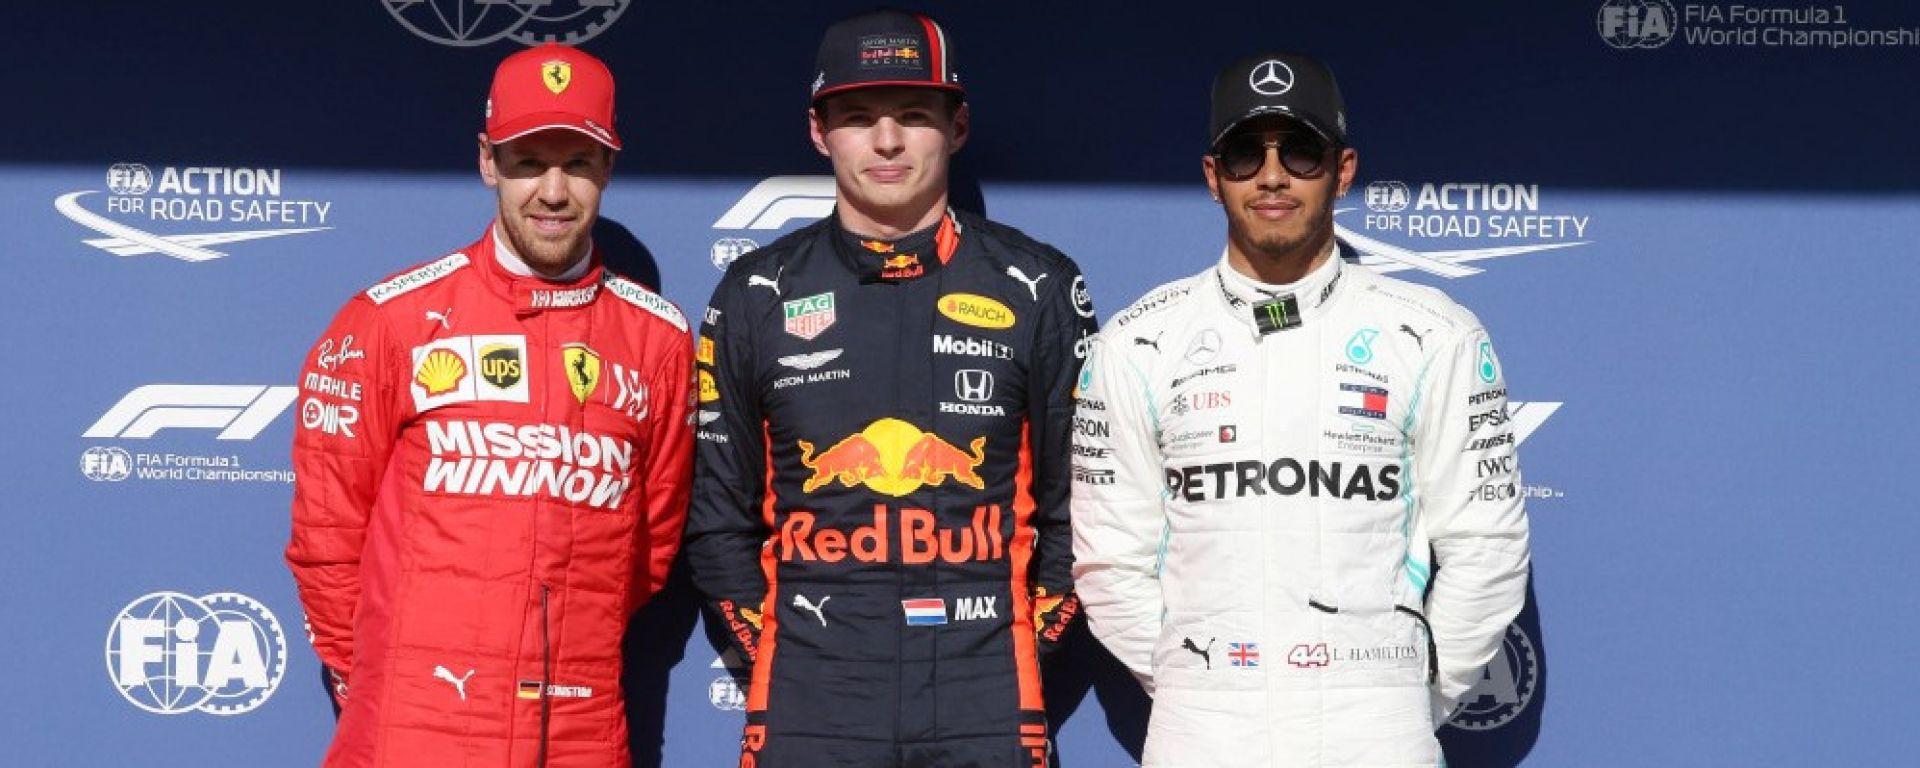 F1, GP Brasile 2019: Sebastian Vettel (Ferrari), Max Verstappen (Red Bull) e Lewis Hamilton (Mercedes) al termine delle qualific